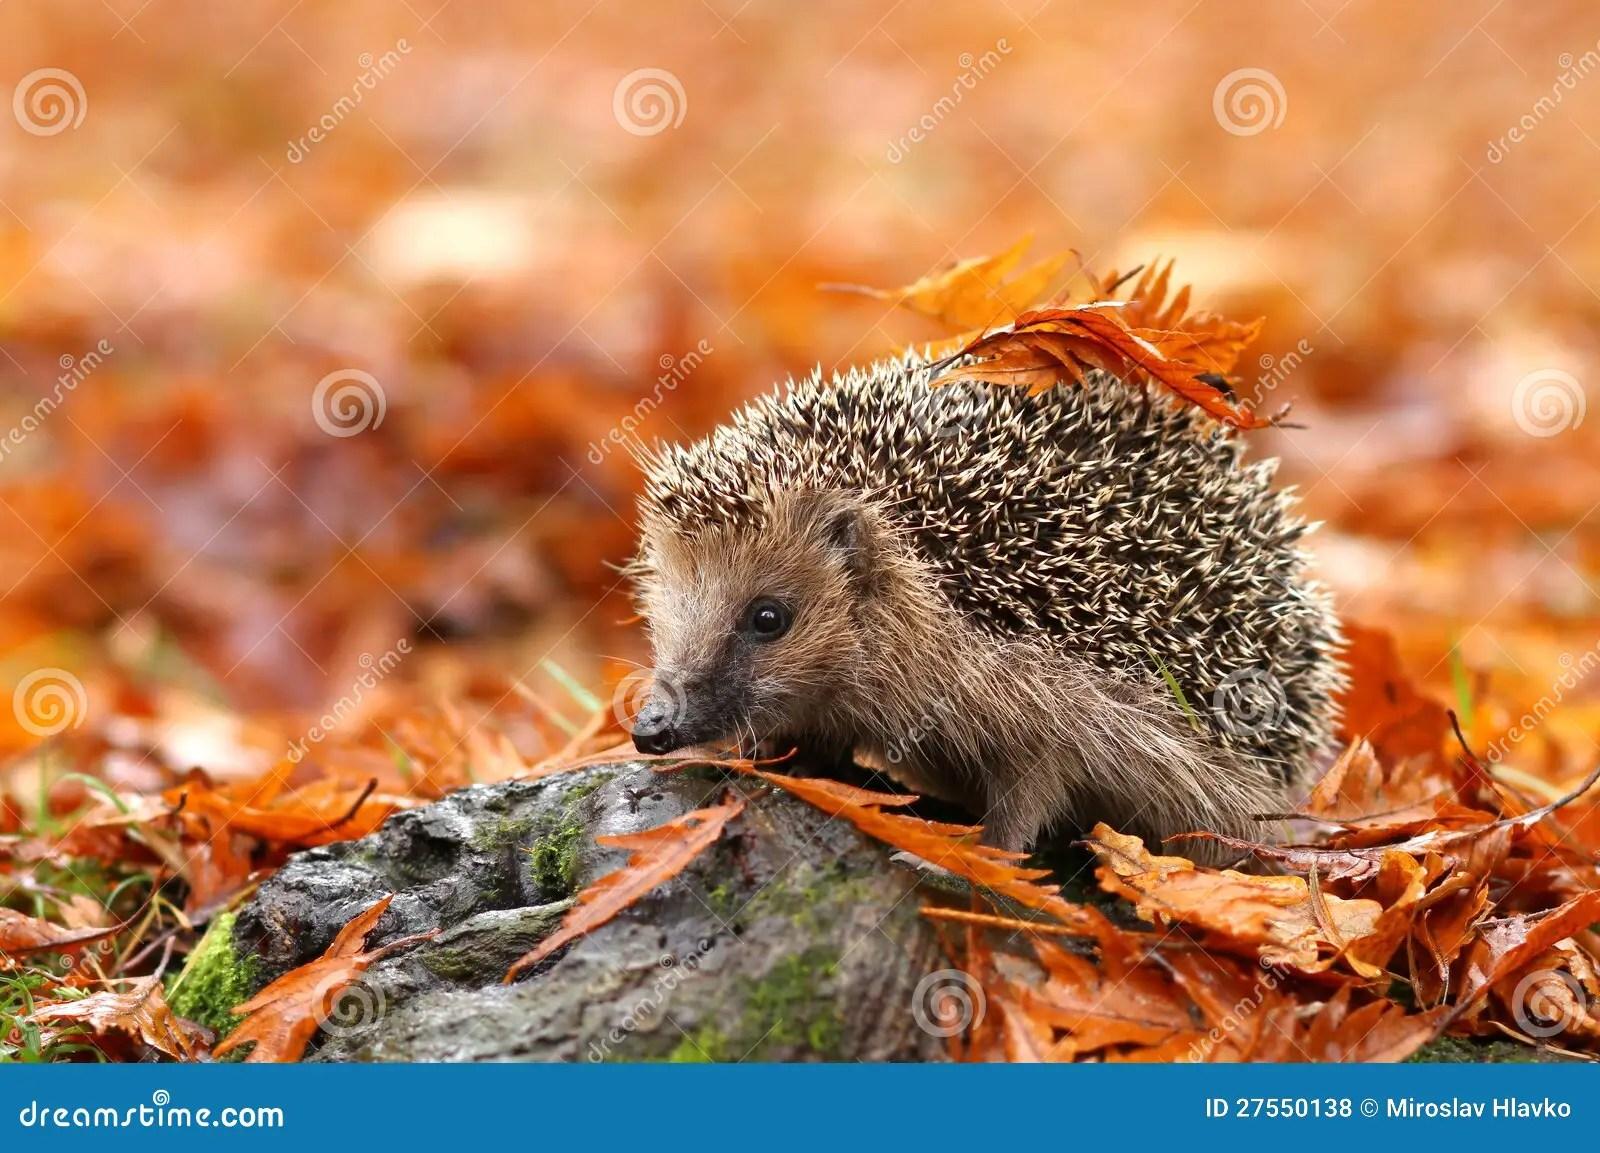 Fall Hedgehog Wallpaper Hedgehog Royalty Free Stock Photos Image 27550138